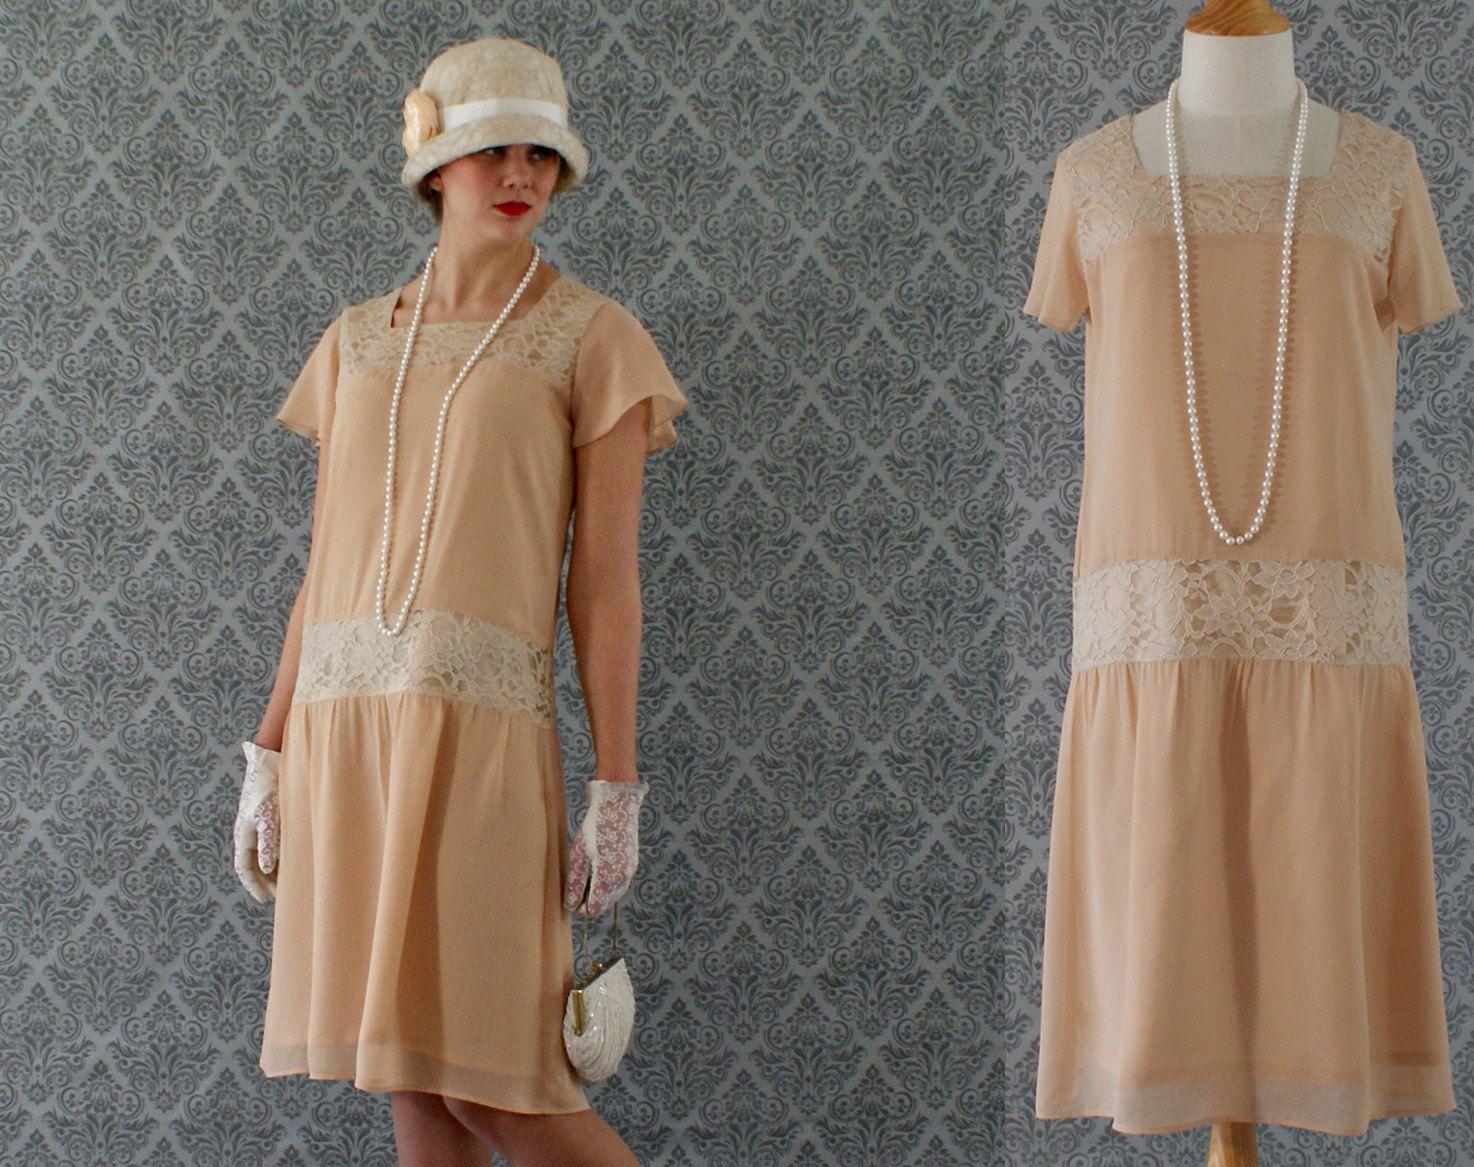 Lady Angel Free Shipping Short Beige Chiffon Bridesmaid: Flapper Dress 1920s Dress Great Gatsby By